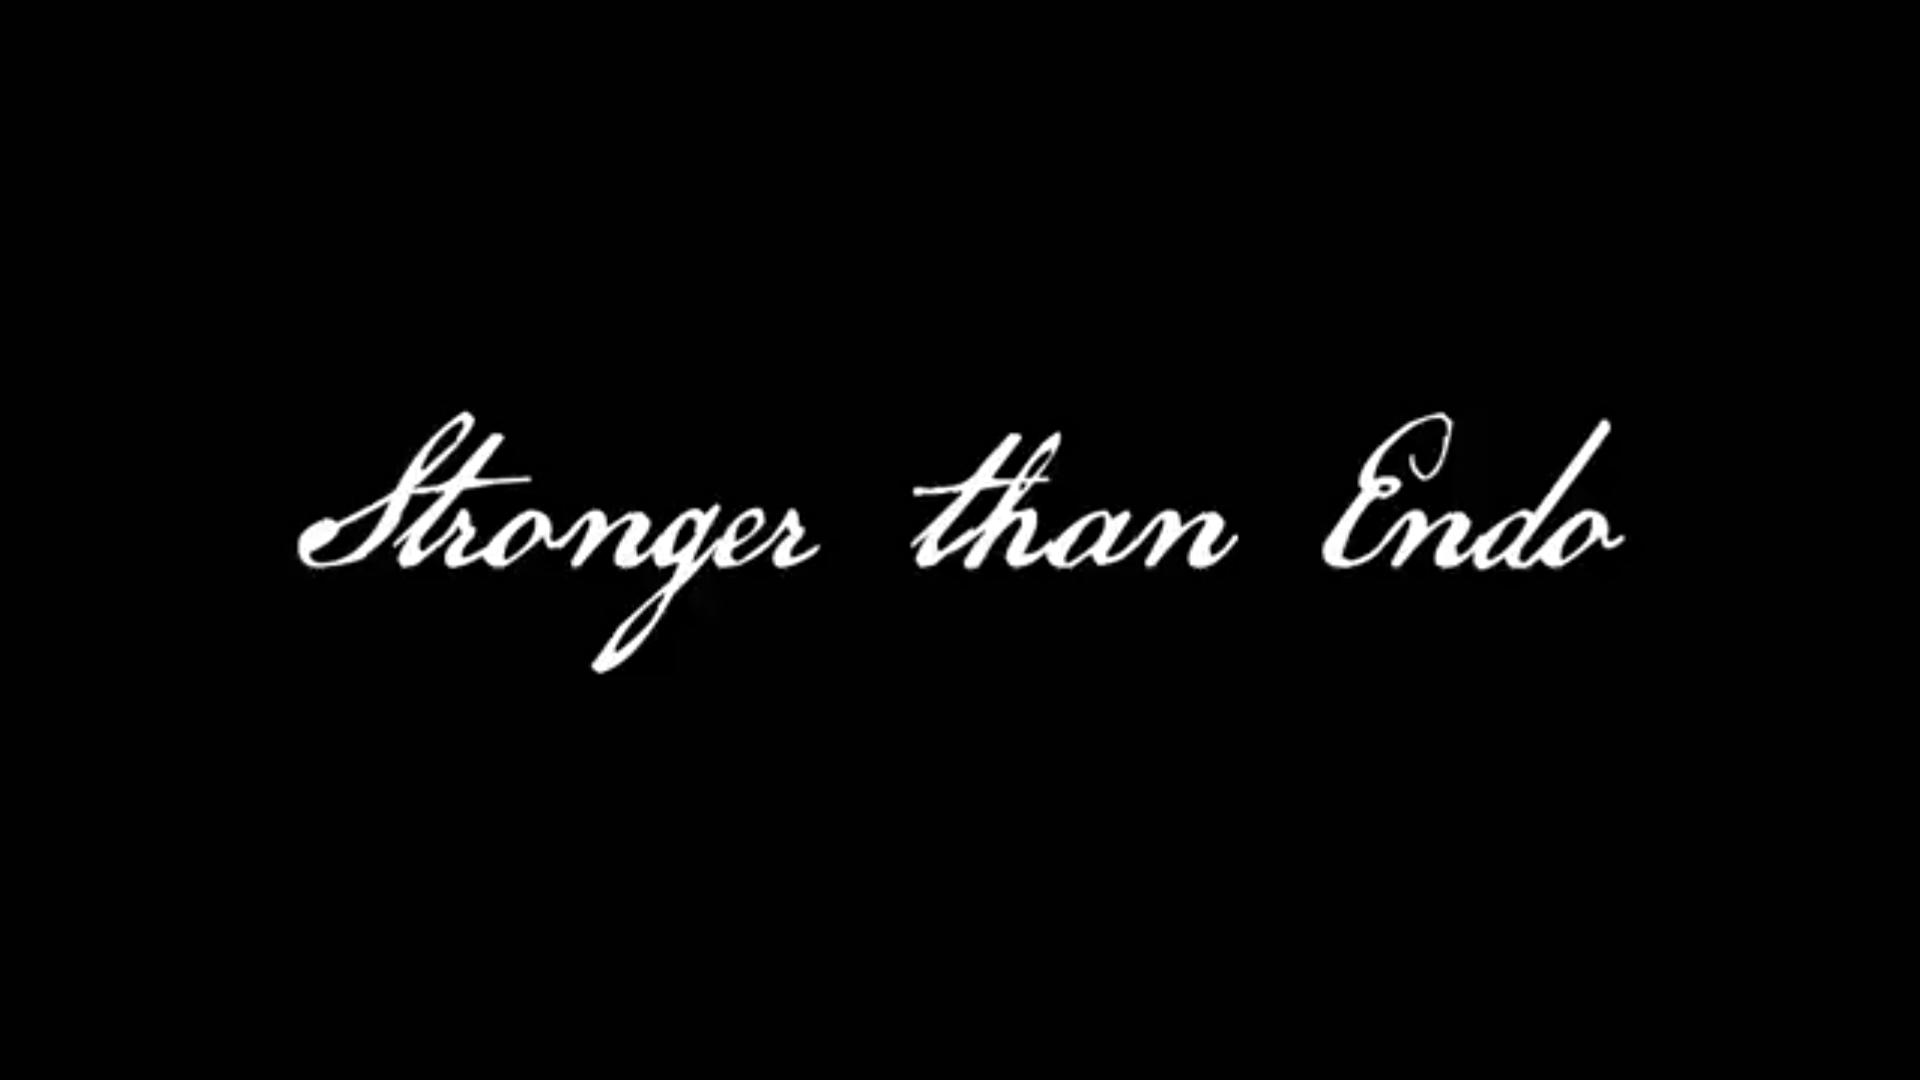 White words on black background: Stronger than endo